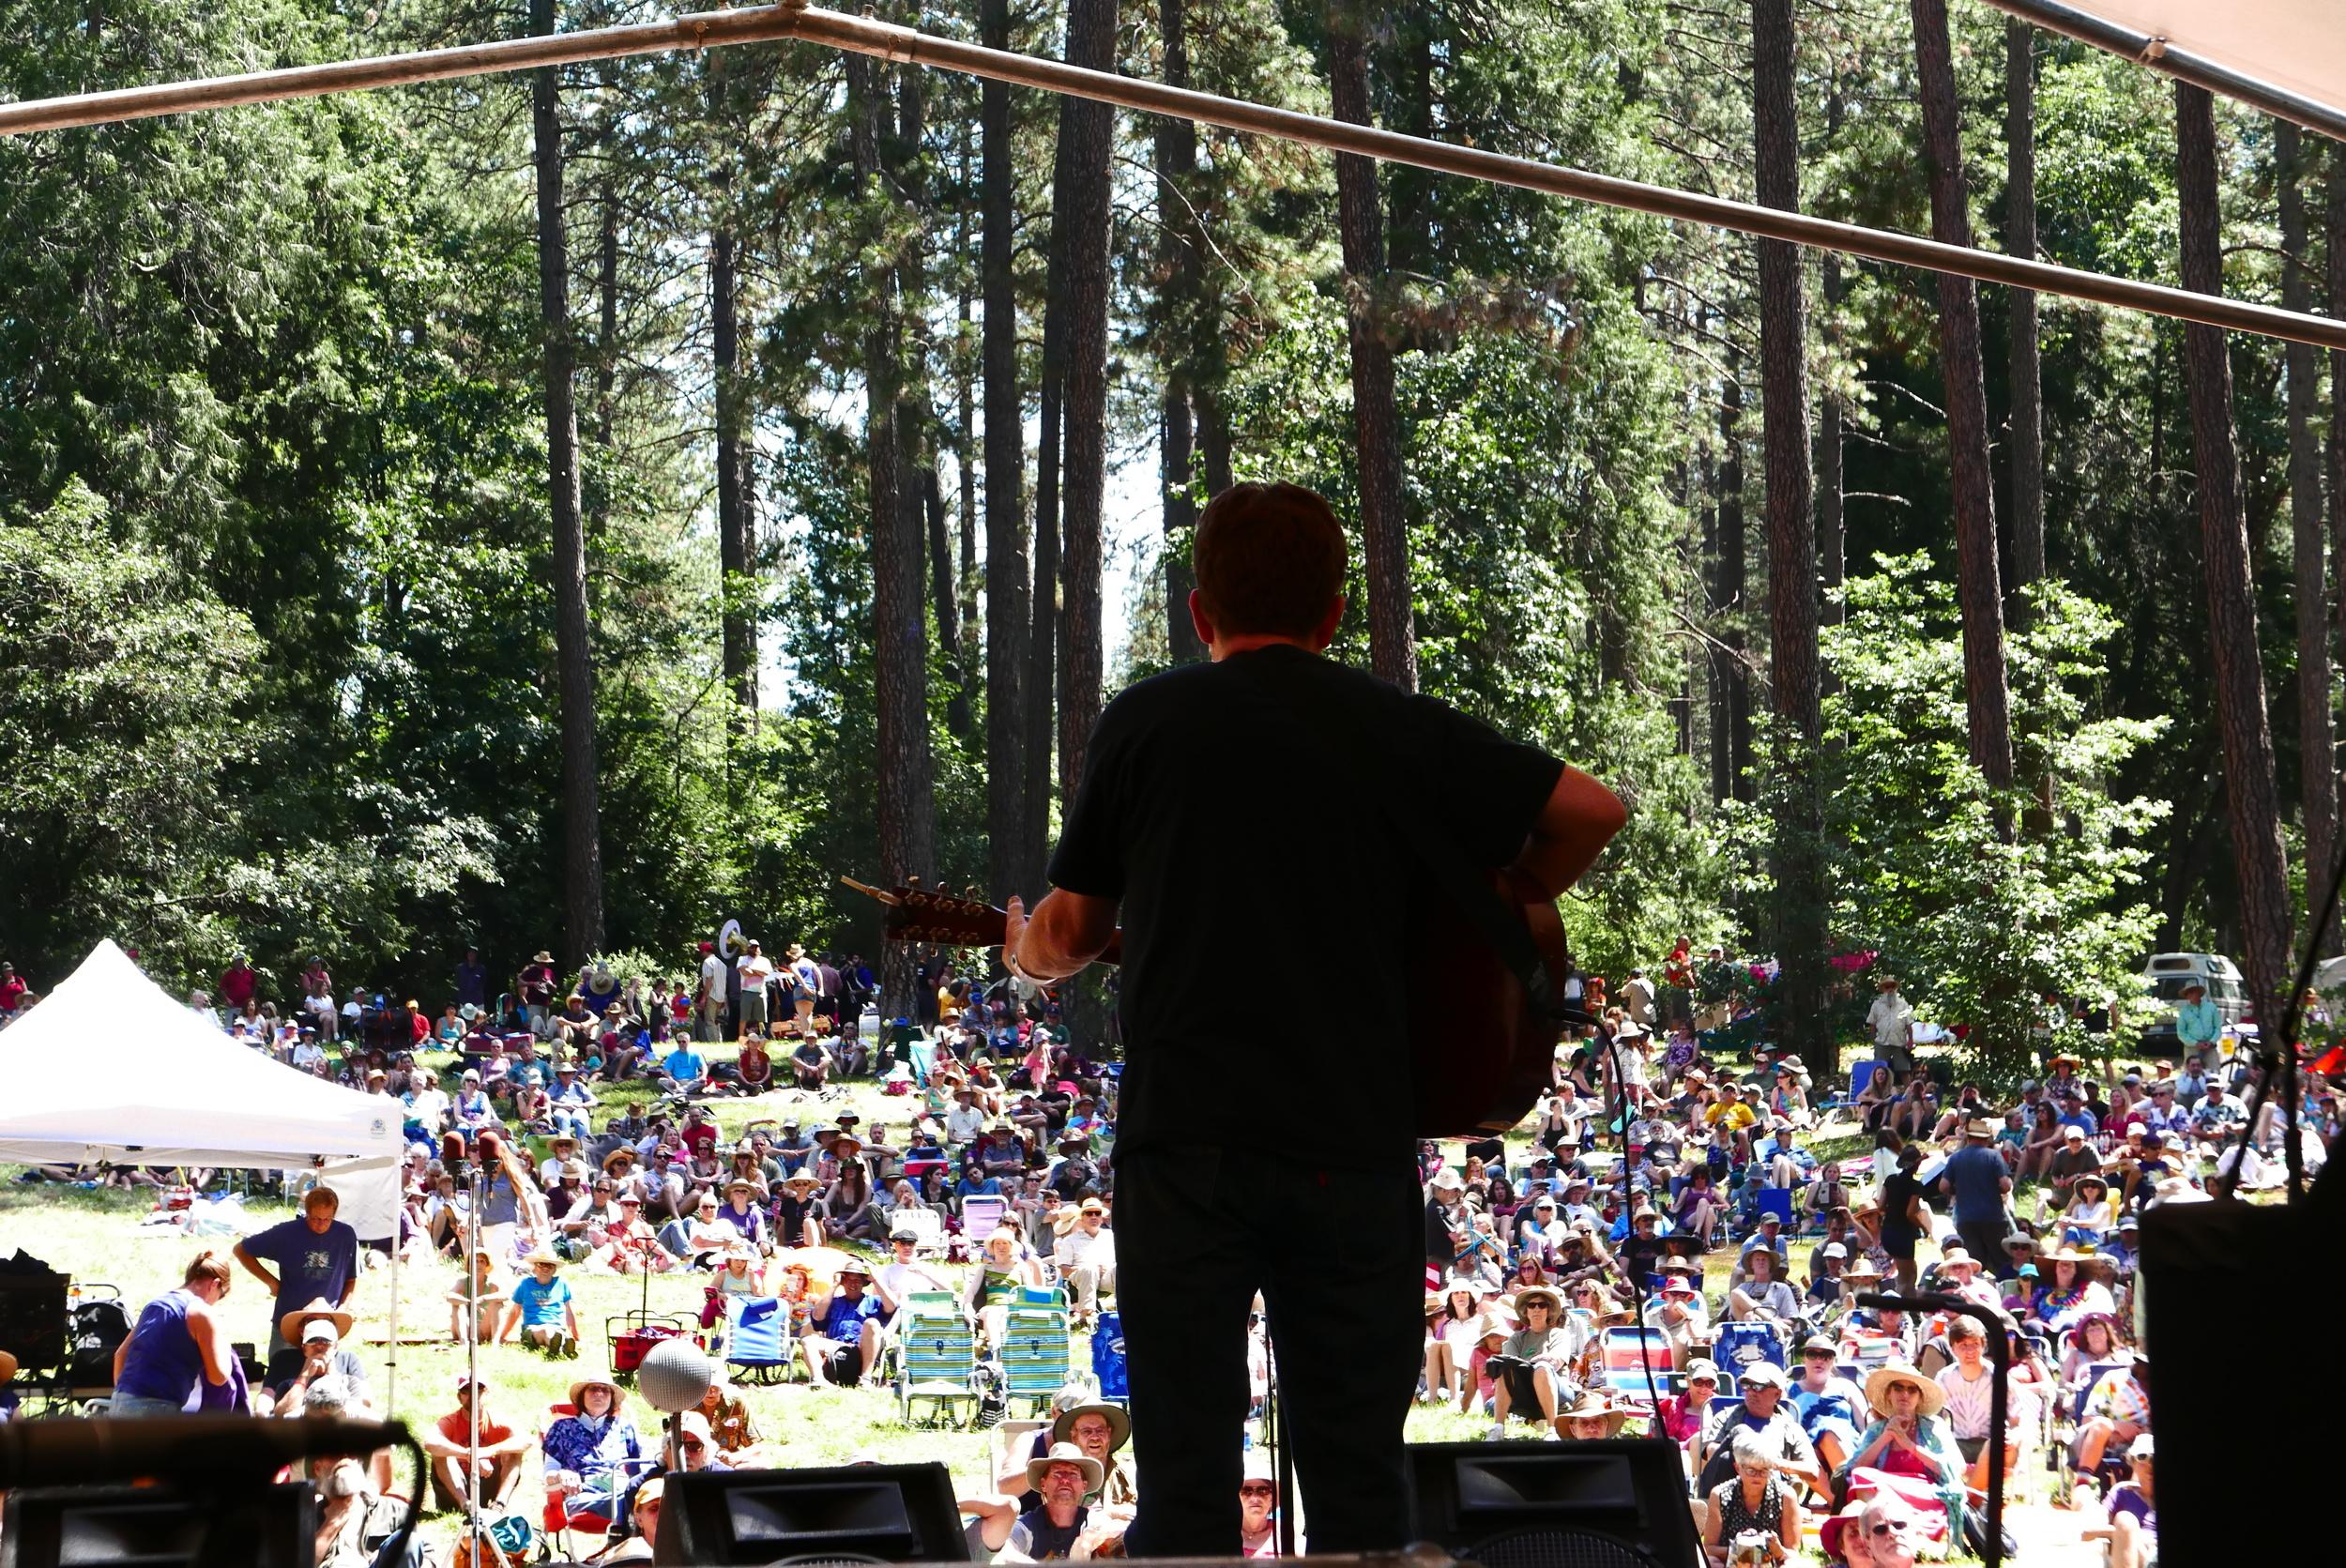 Tim O'brien at the Sunday Revival, Strawberry Music Festival, Spring 2016, Grass Valley, CA. Photo: Gregg McVicar